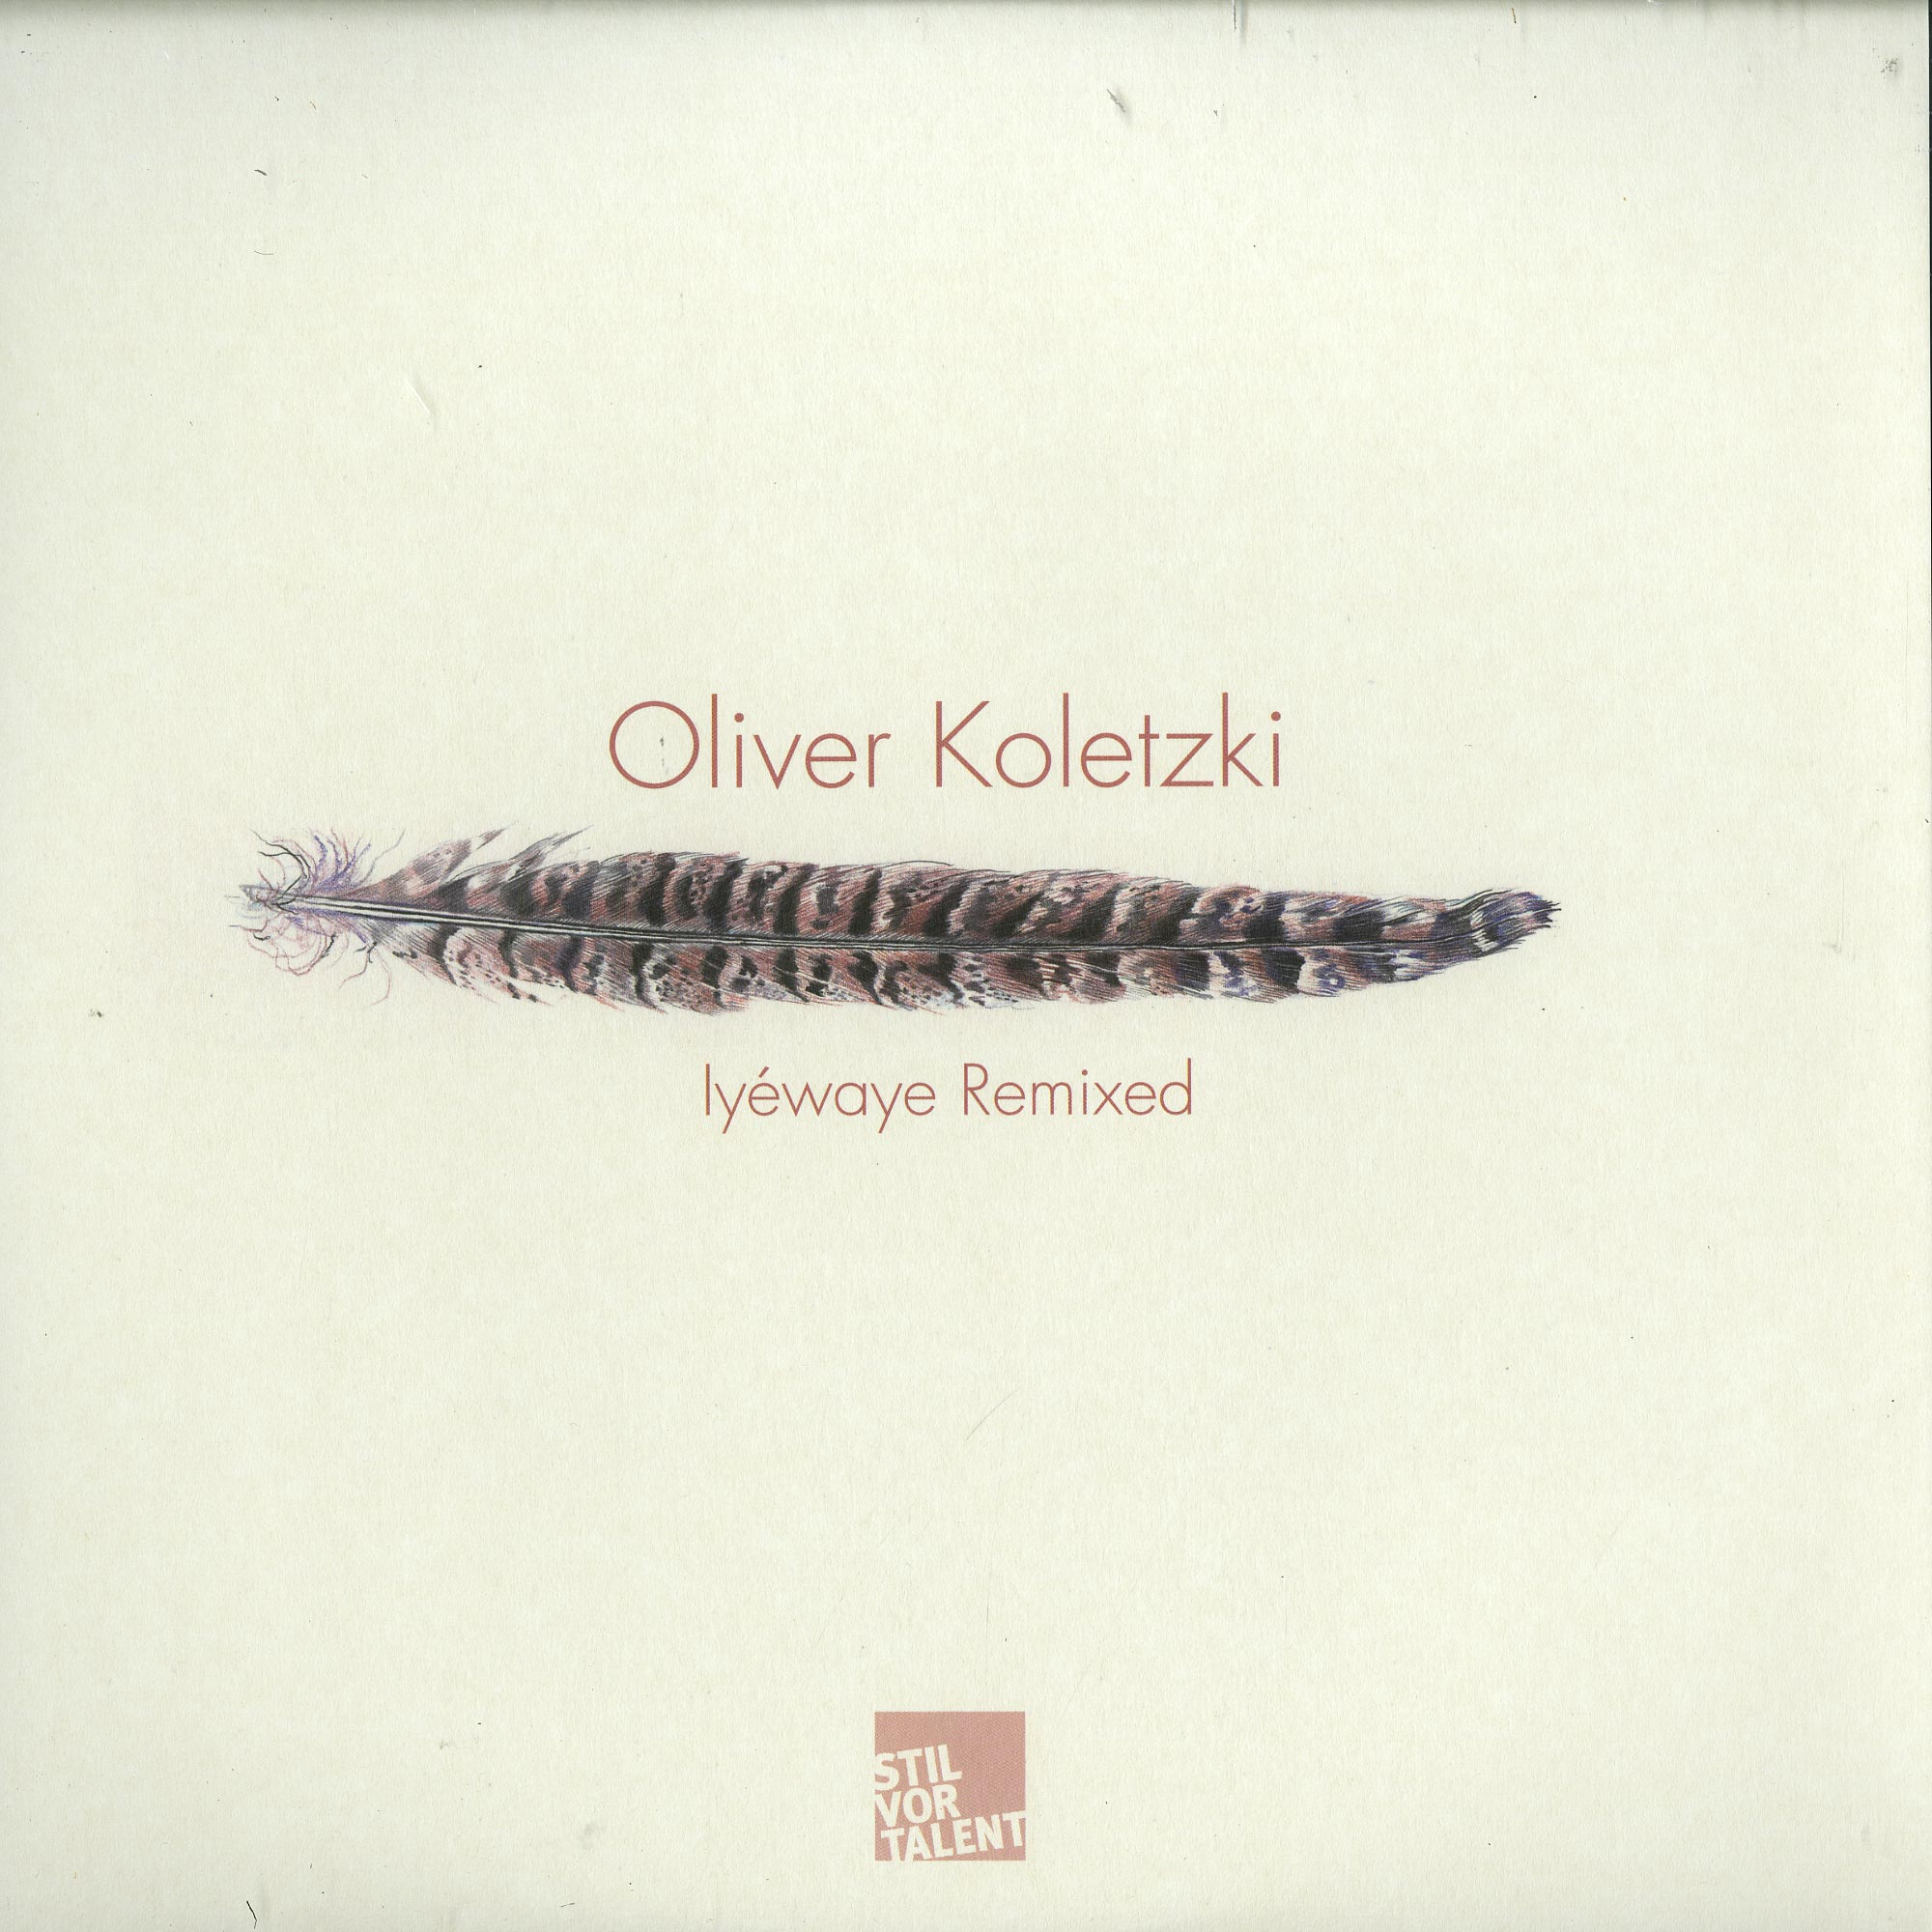 Oliver Koletzki - IYEWAYE REMIXED